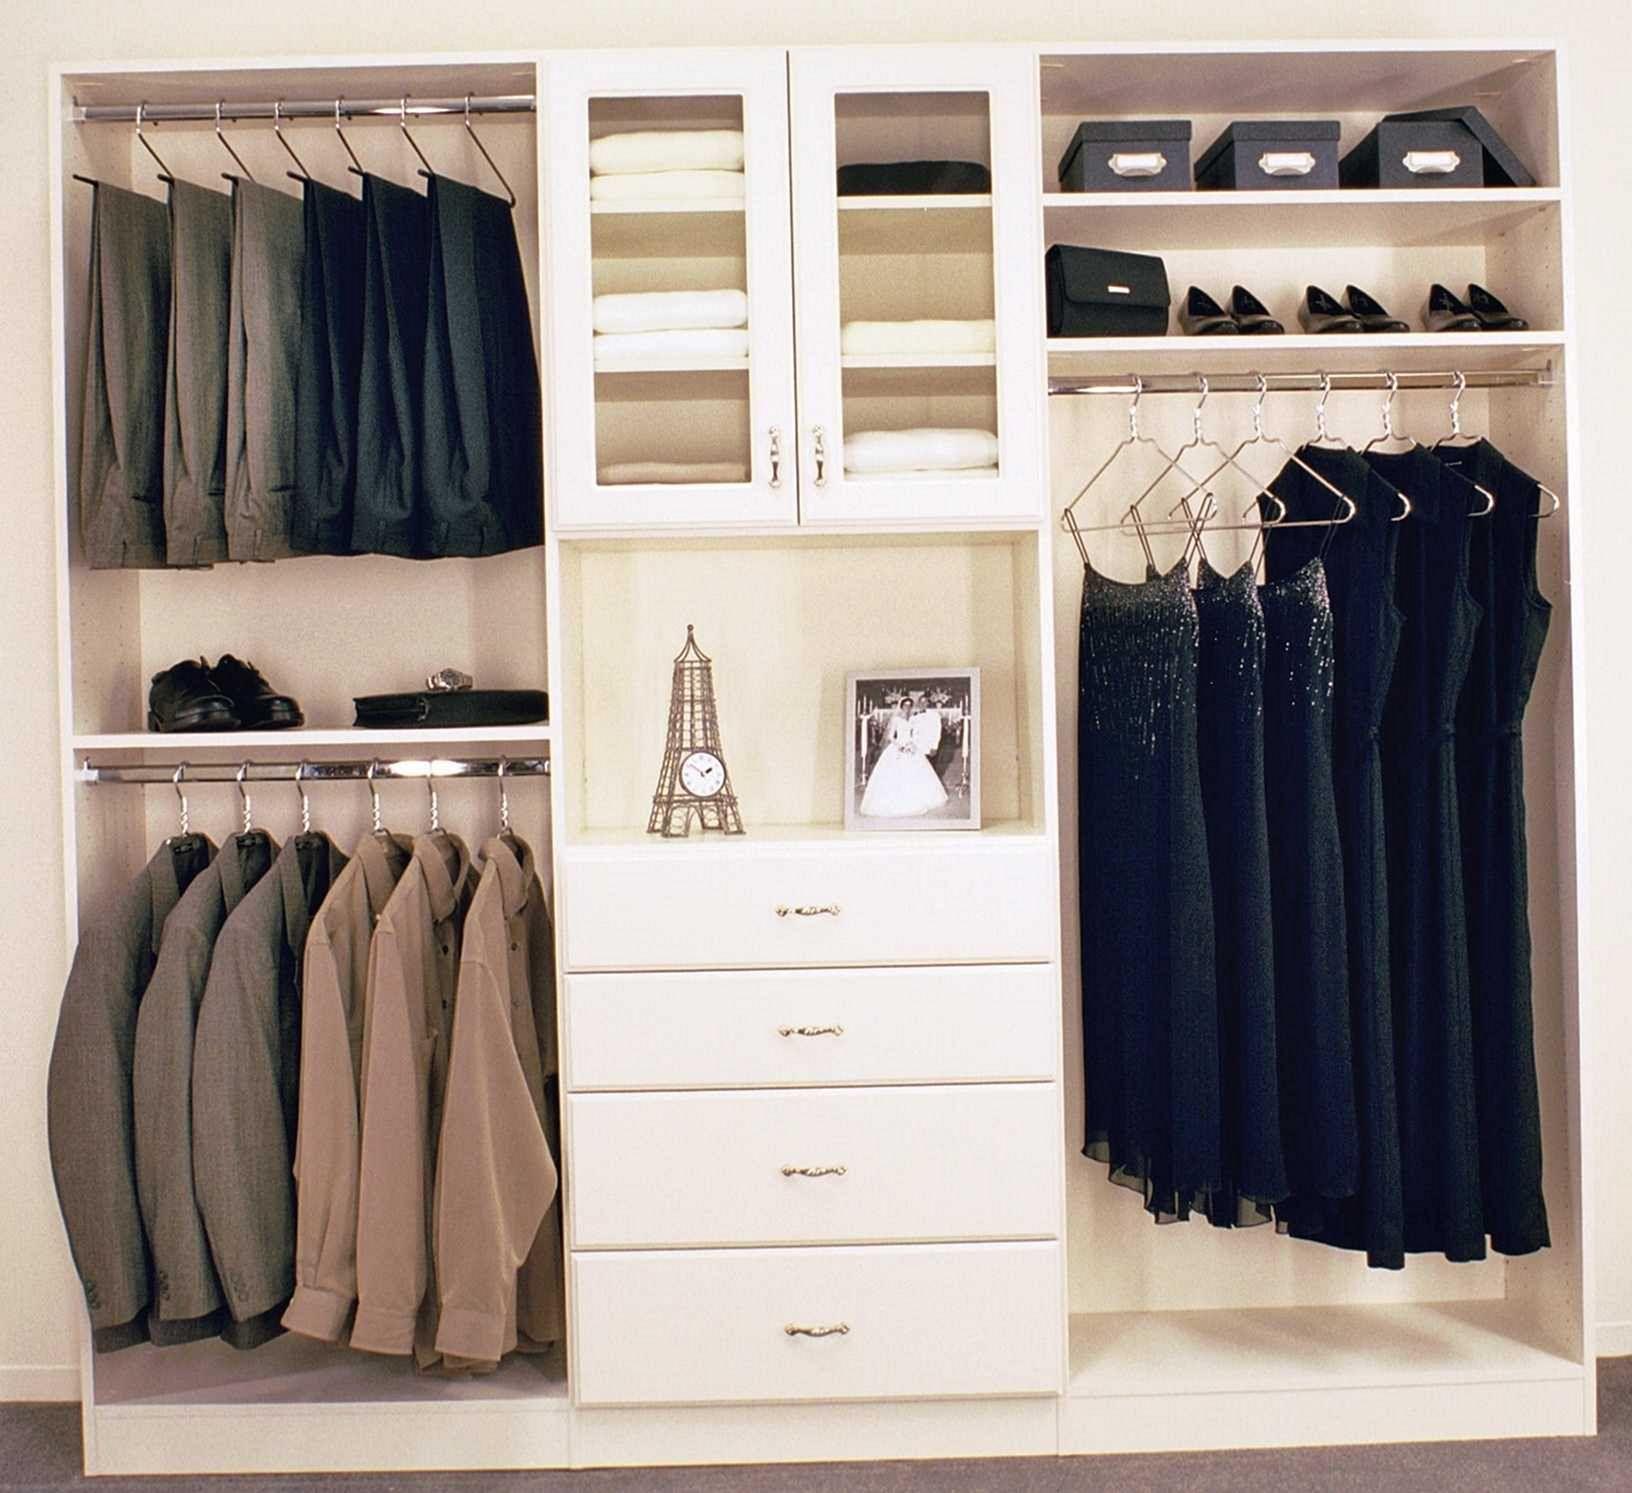 15 Diy Creative Clothes Storage Ideas For Home That You Need To Imitate Freshouz Com Closet Small Bedroom Closet Bedroom Closet Designs